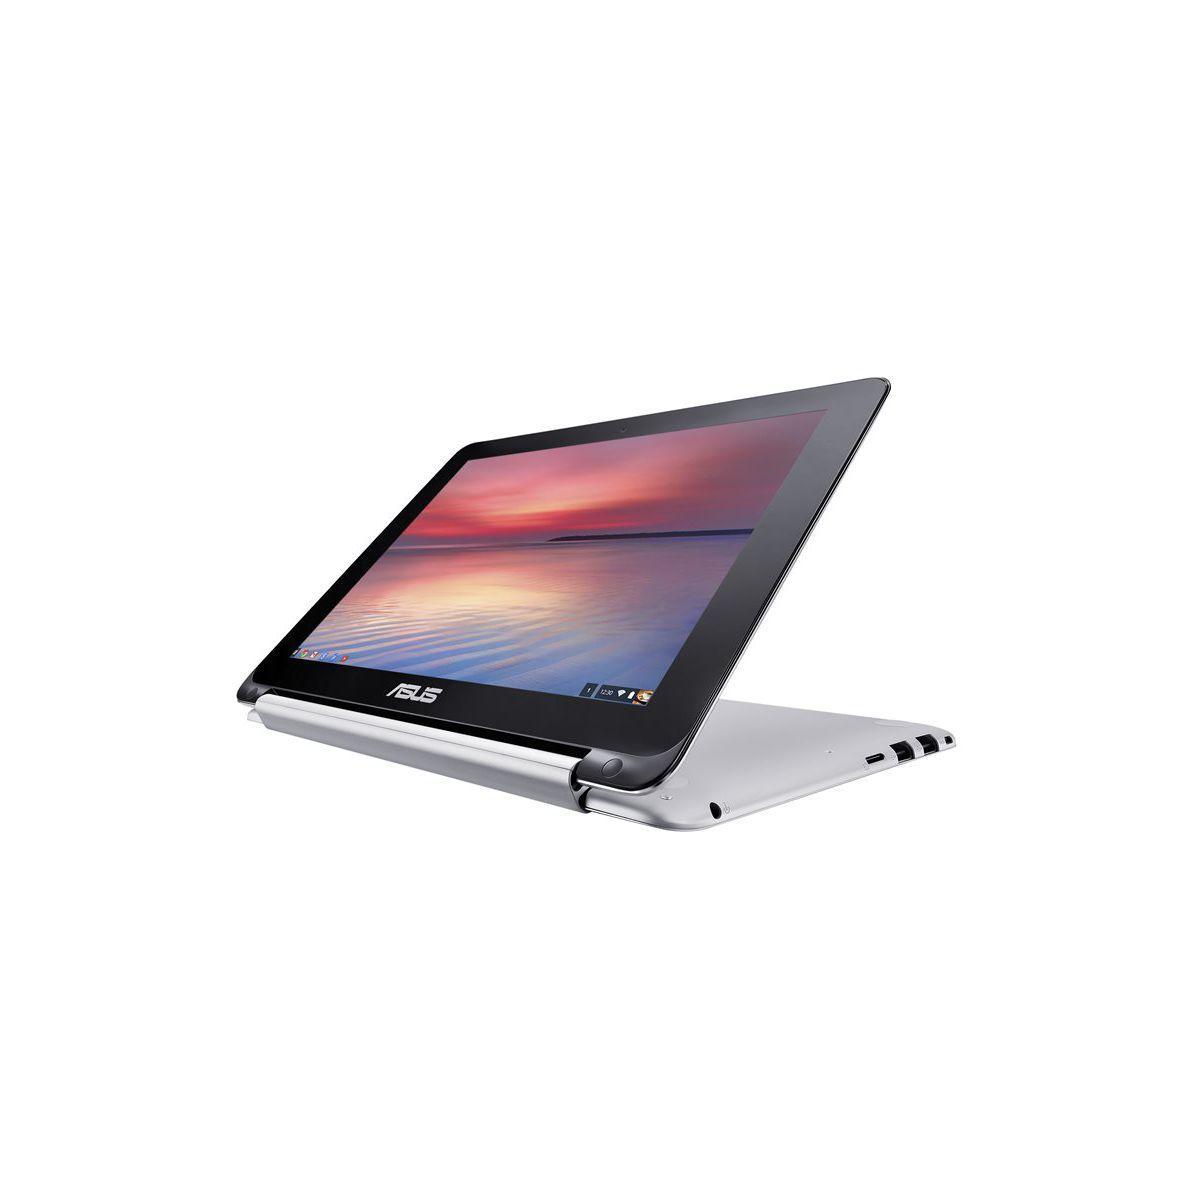 Chromebook asus flip c100pa-fs0002 (photo)